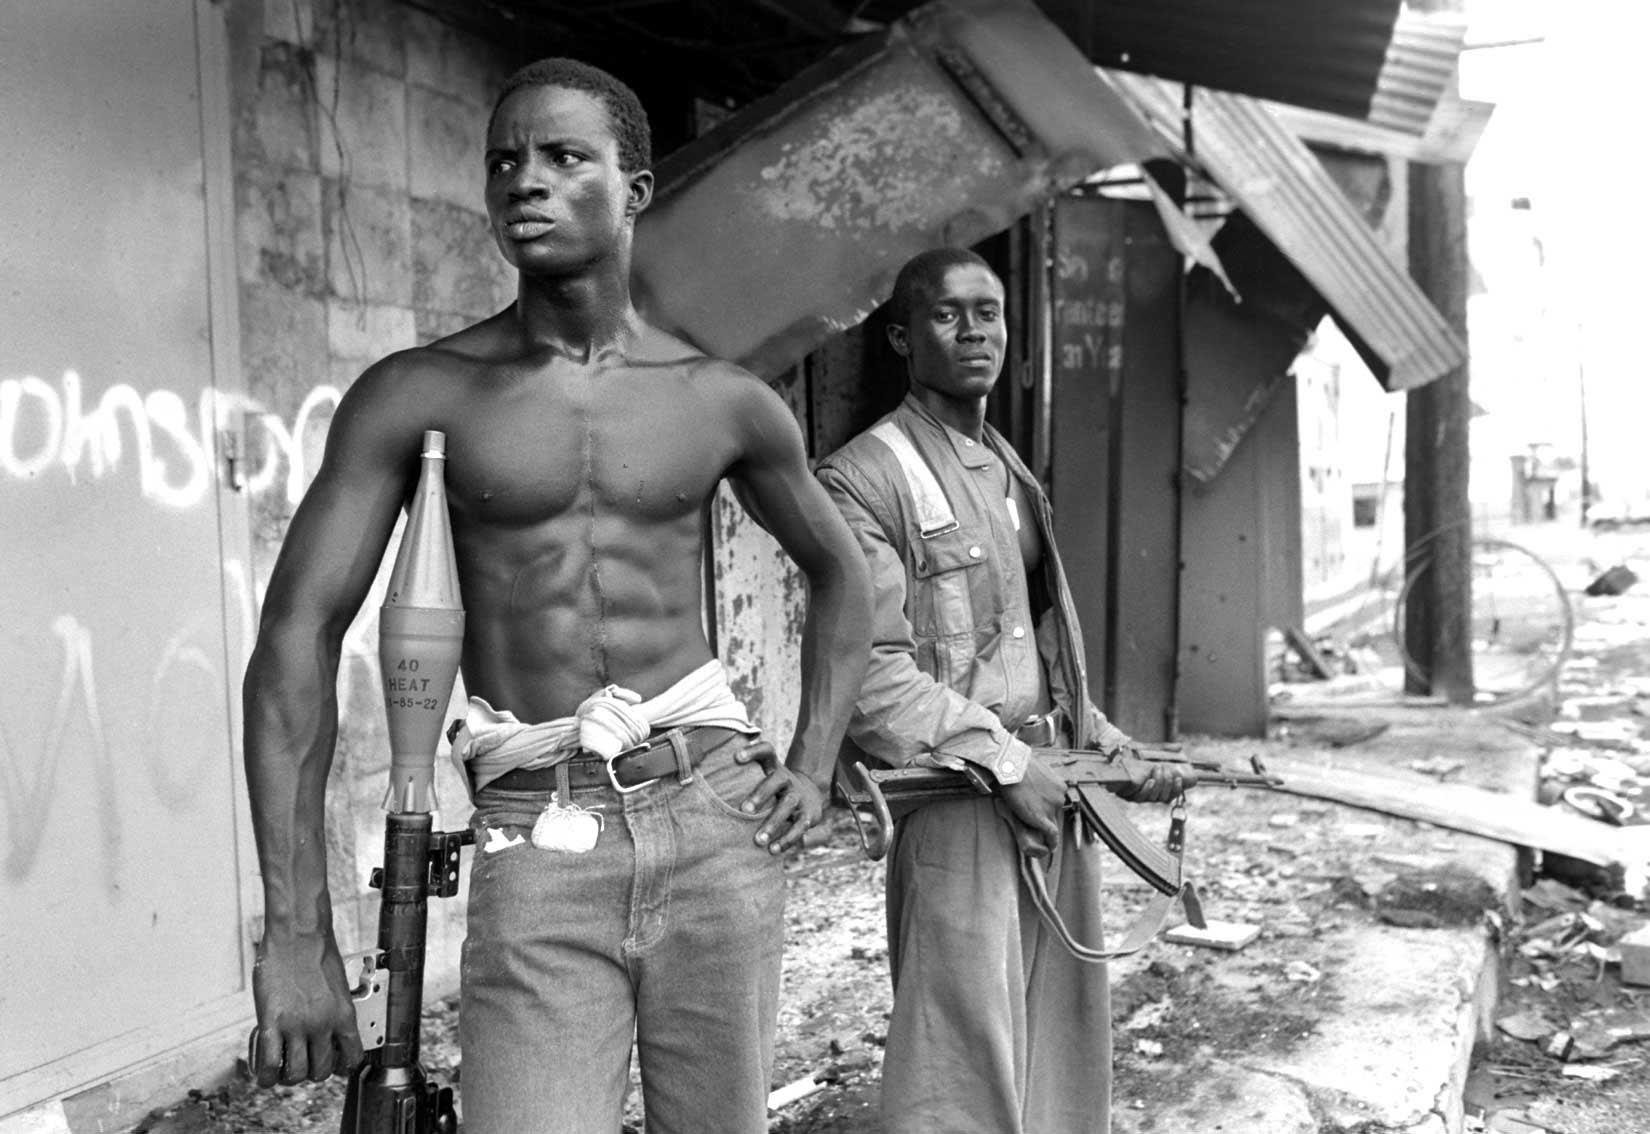 http://www.hrw.org/reports/2005/westafrica0405/westafrica0405_files/image003.jpg